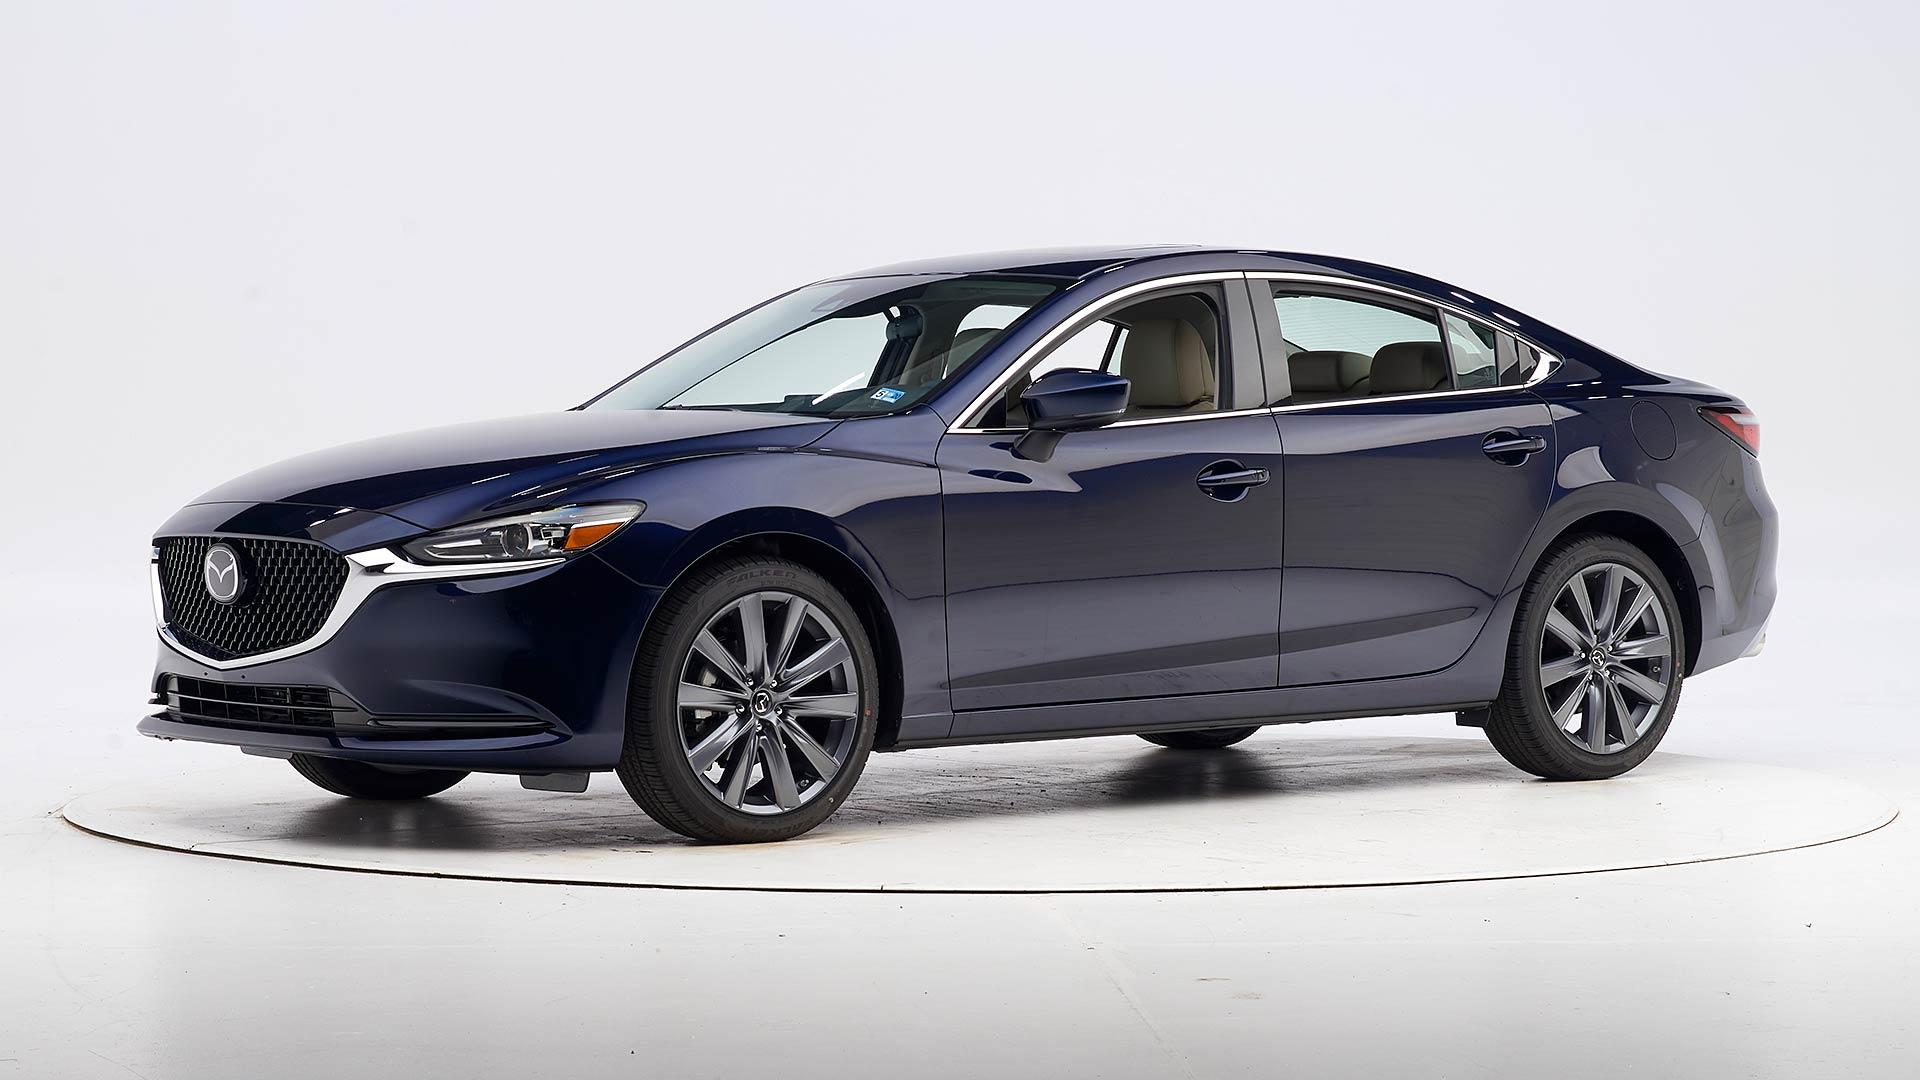 Kekurangan Mazda 6 Spesifikasi